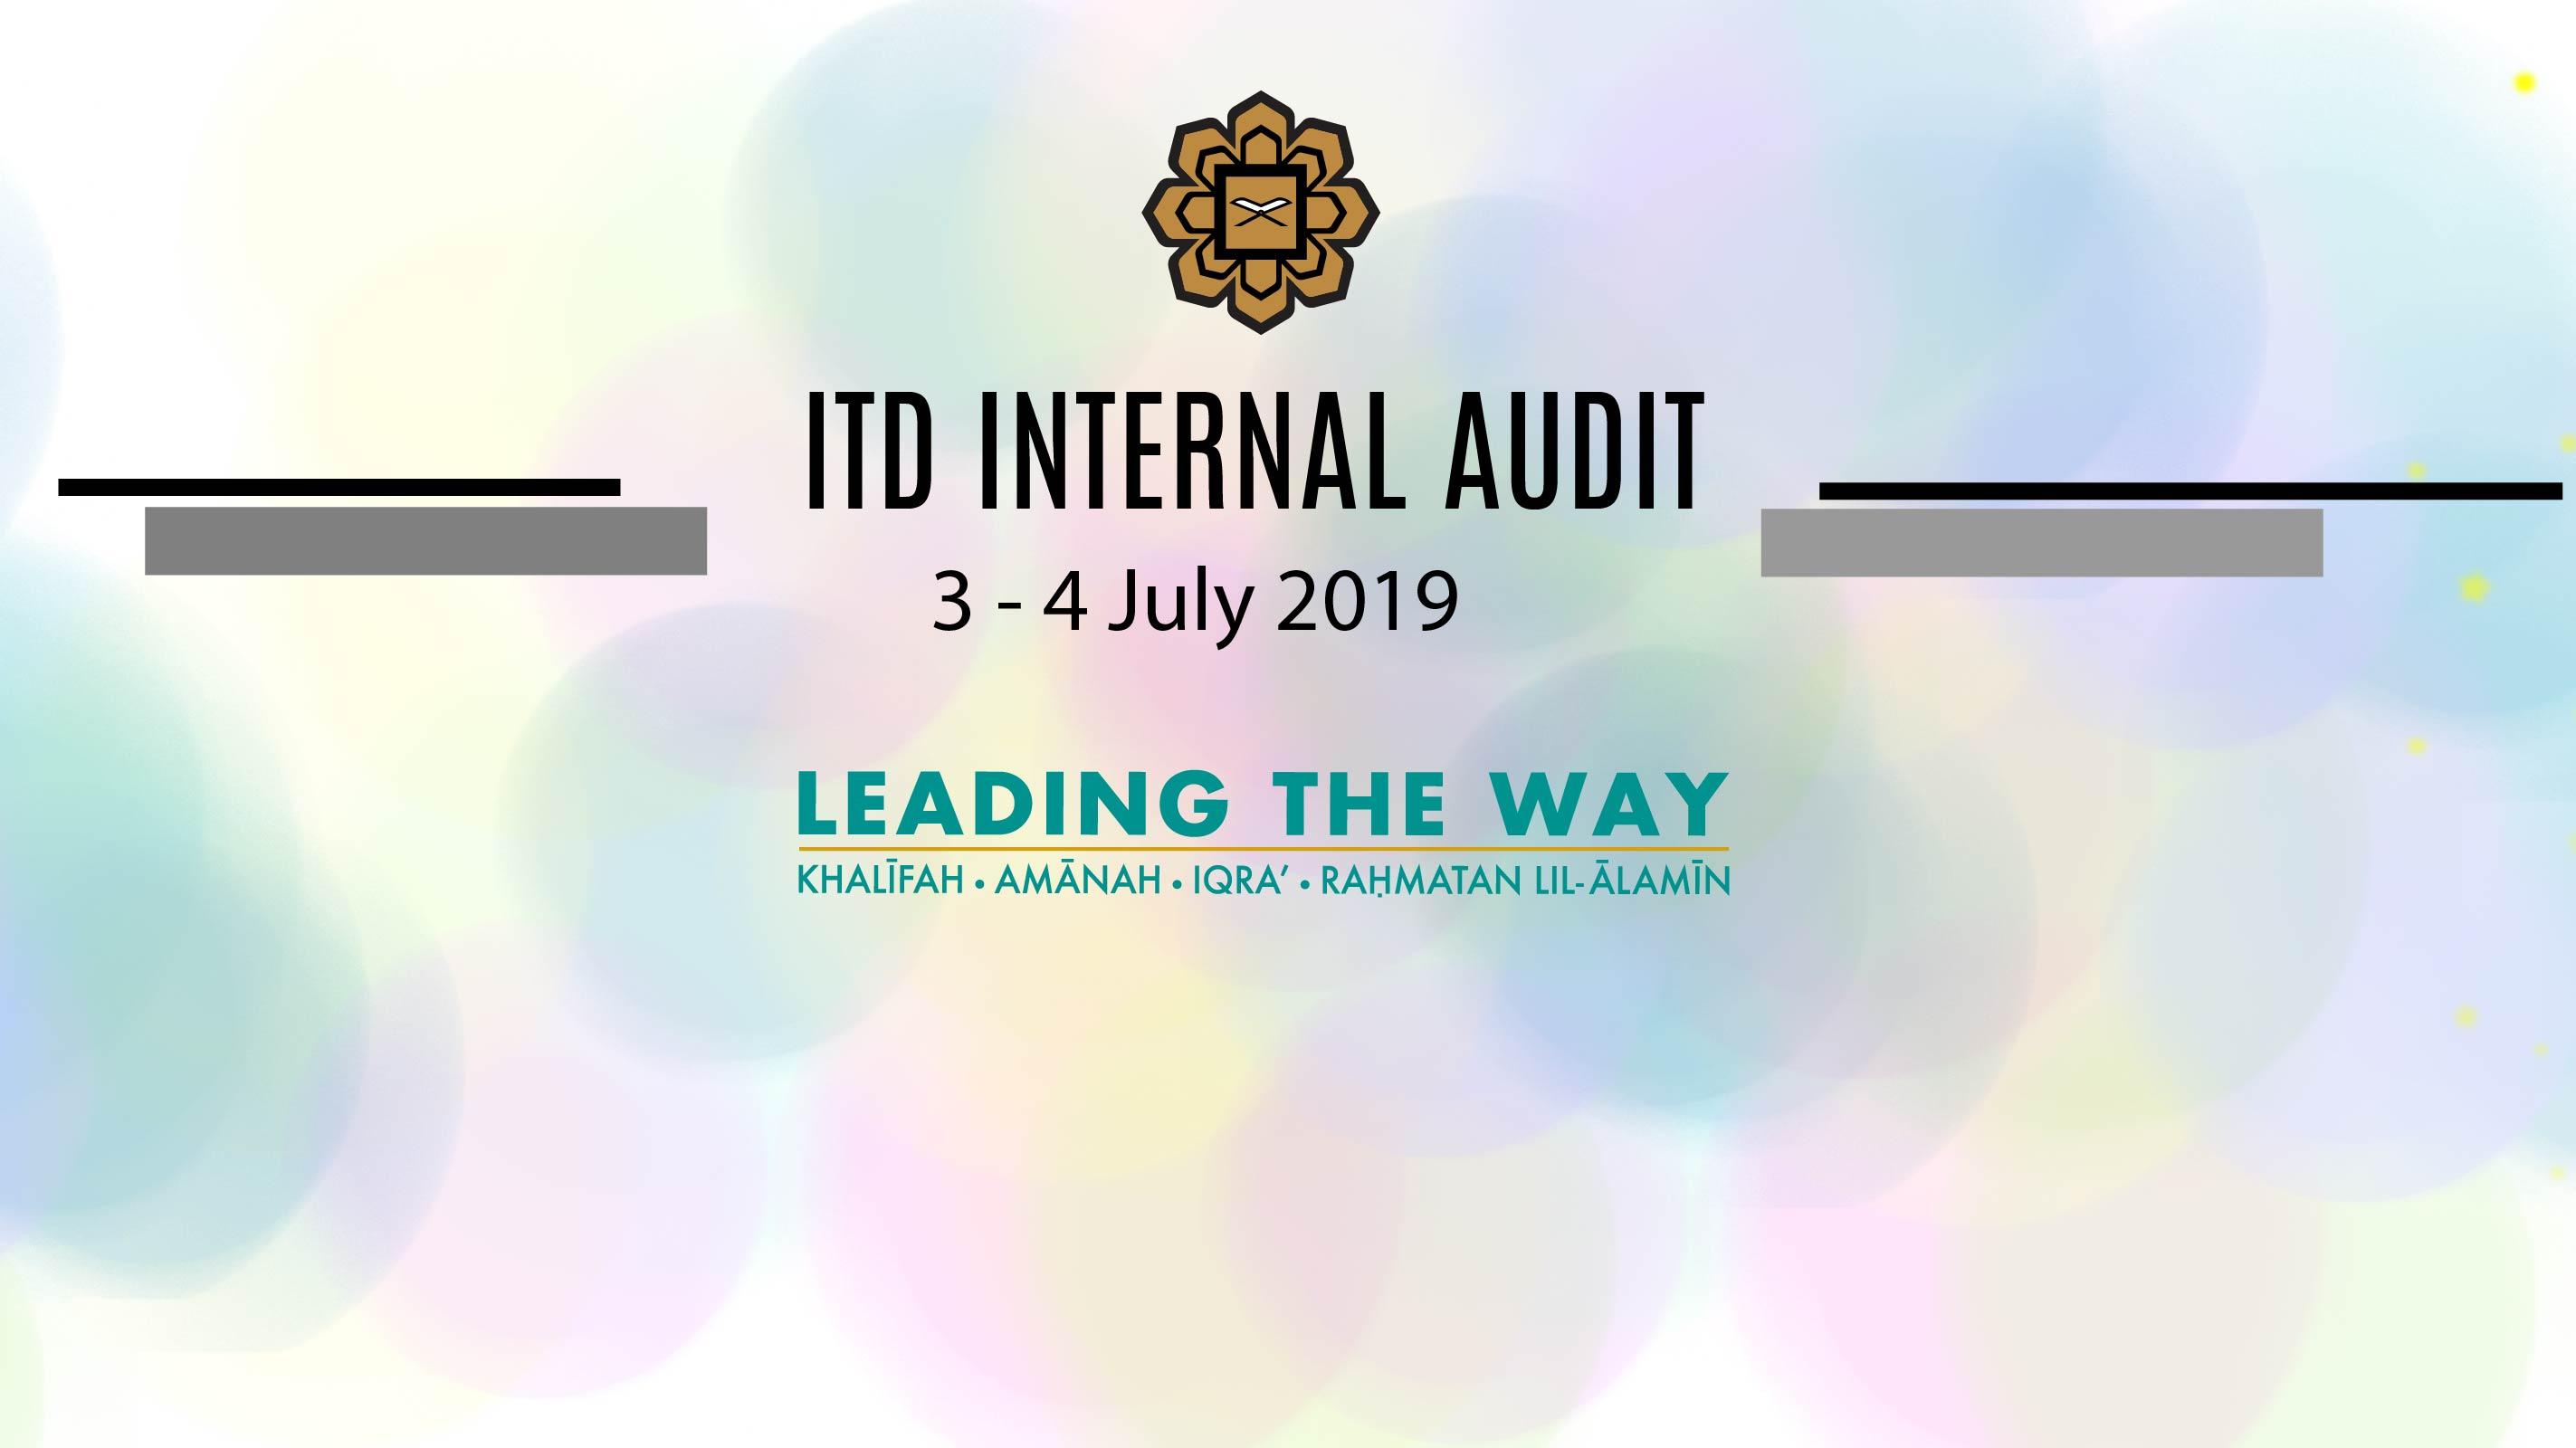 ITD Internal Audit 2019